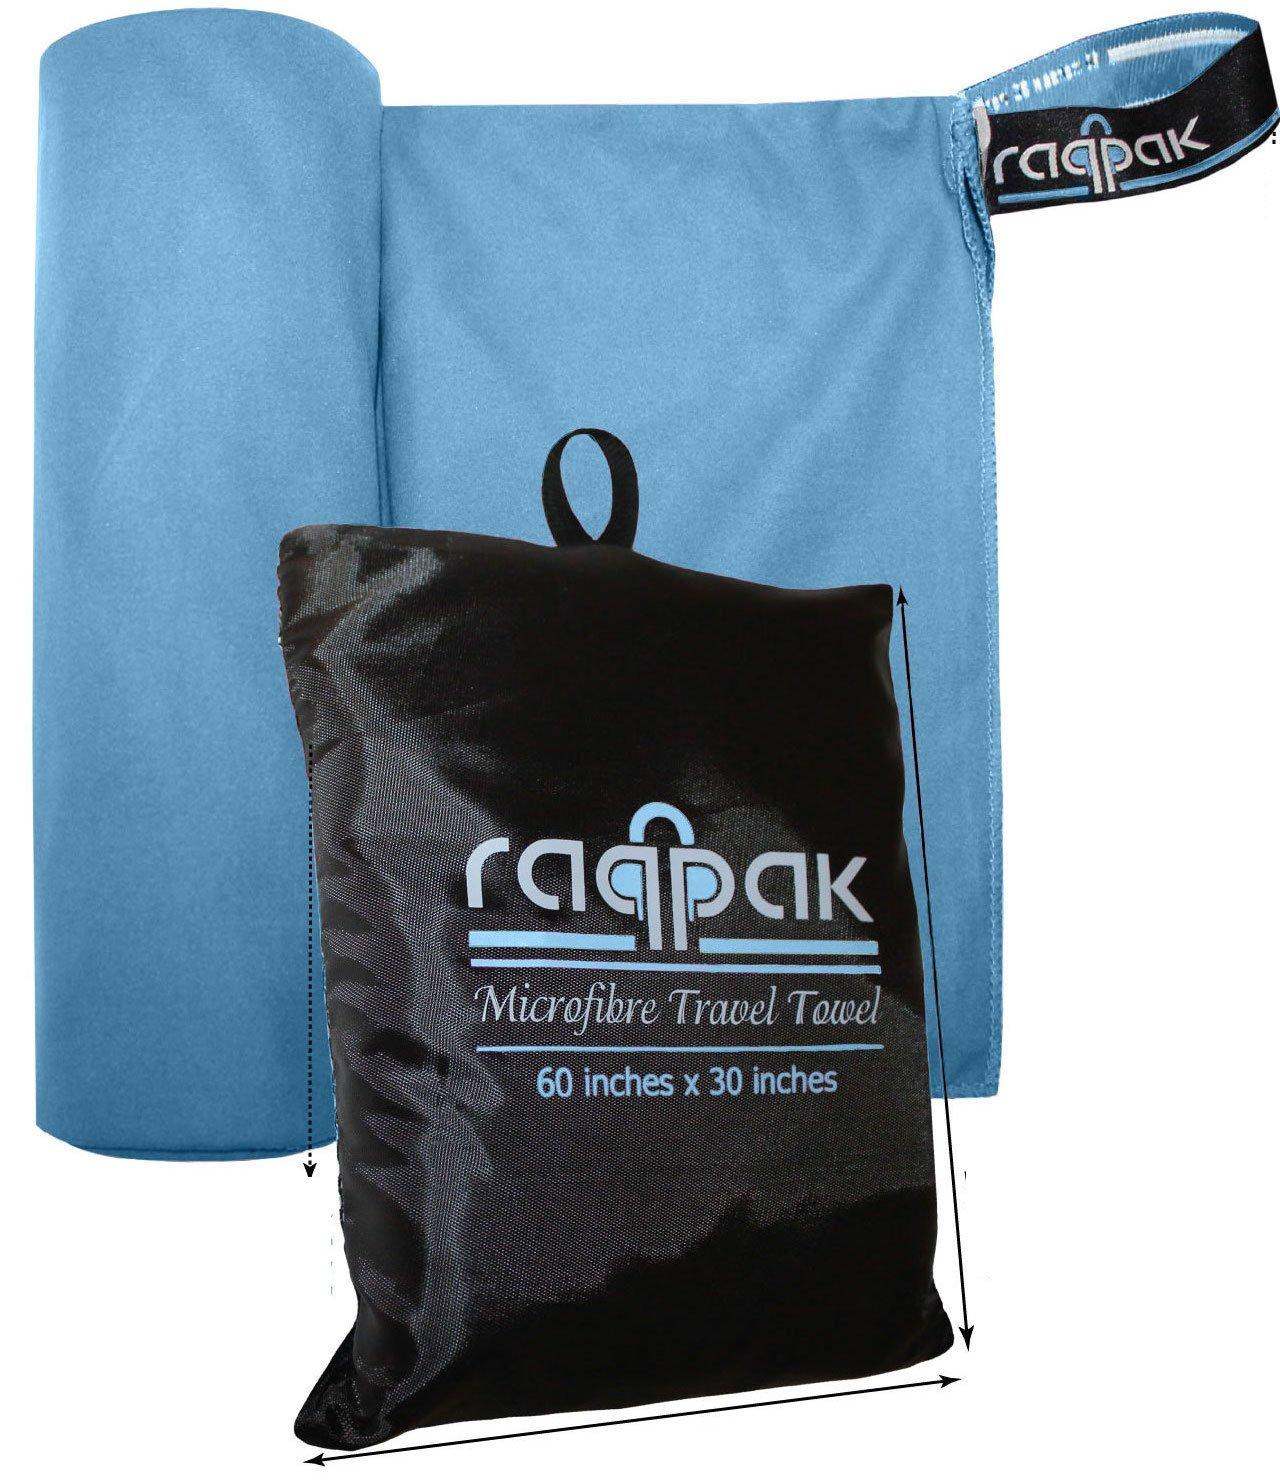 Care Plus® Travel Towel Microfibre groß Reisehandtuch 75 x 150cm